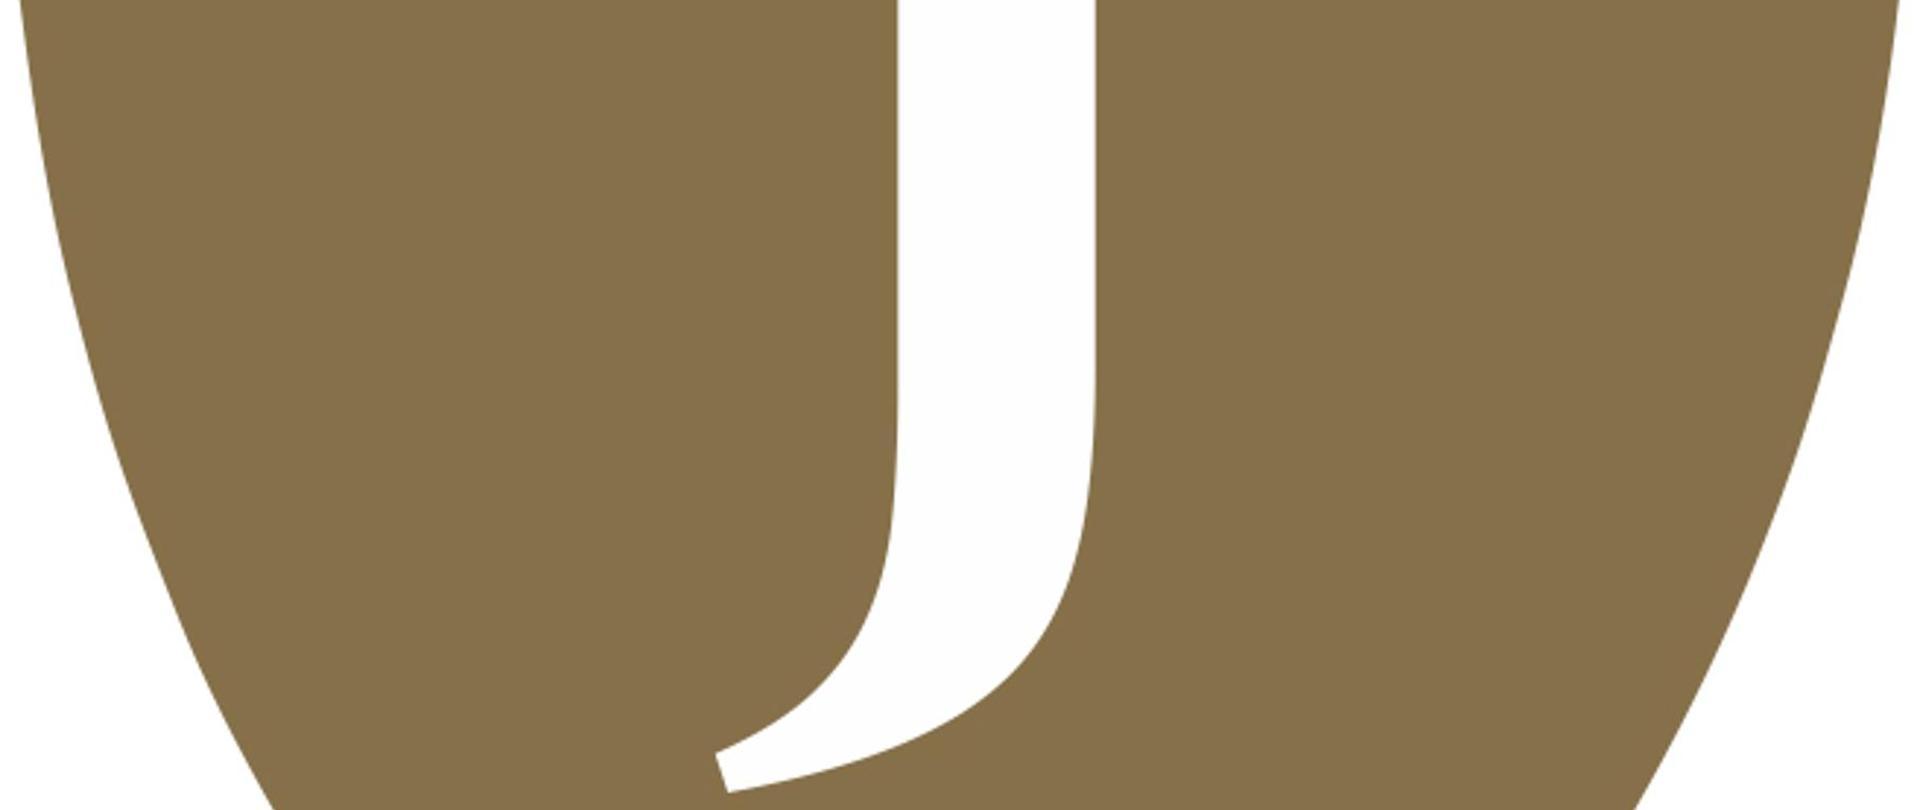 Jijo's emblem.jpg